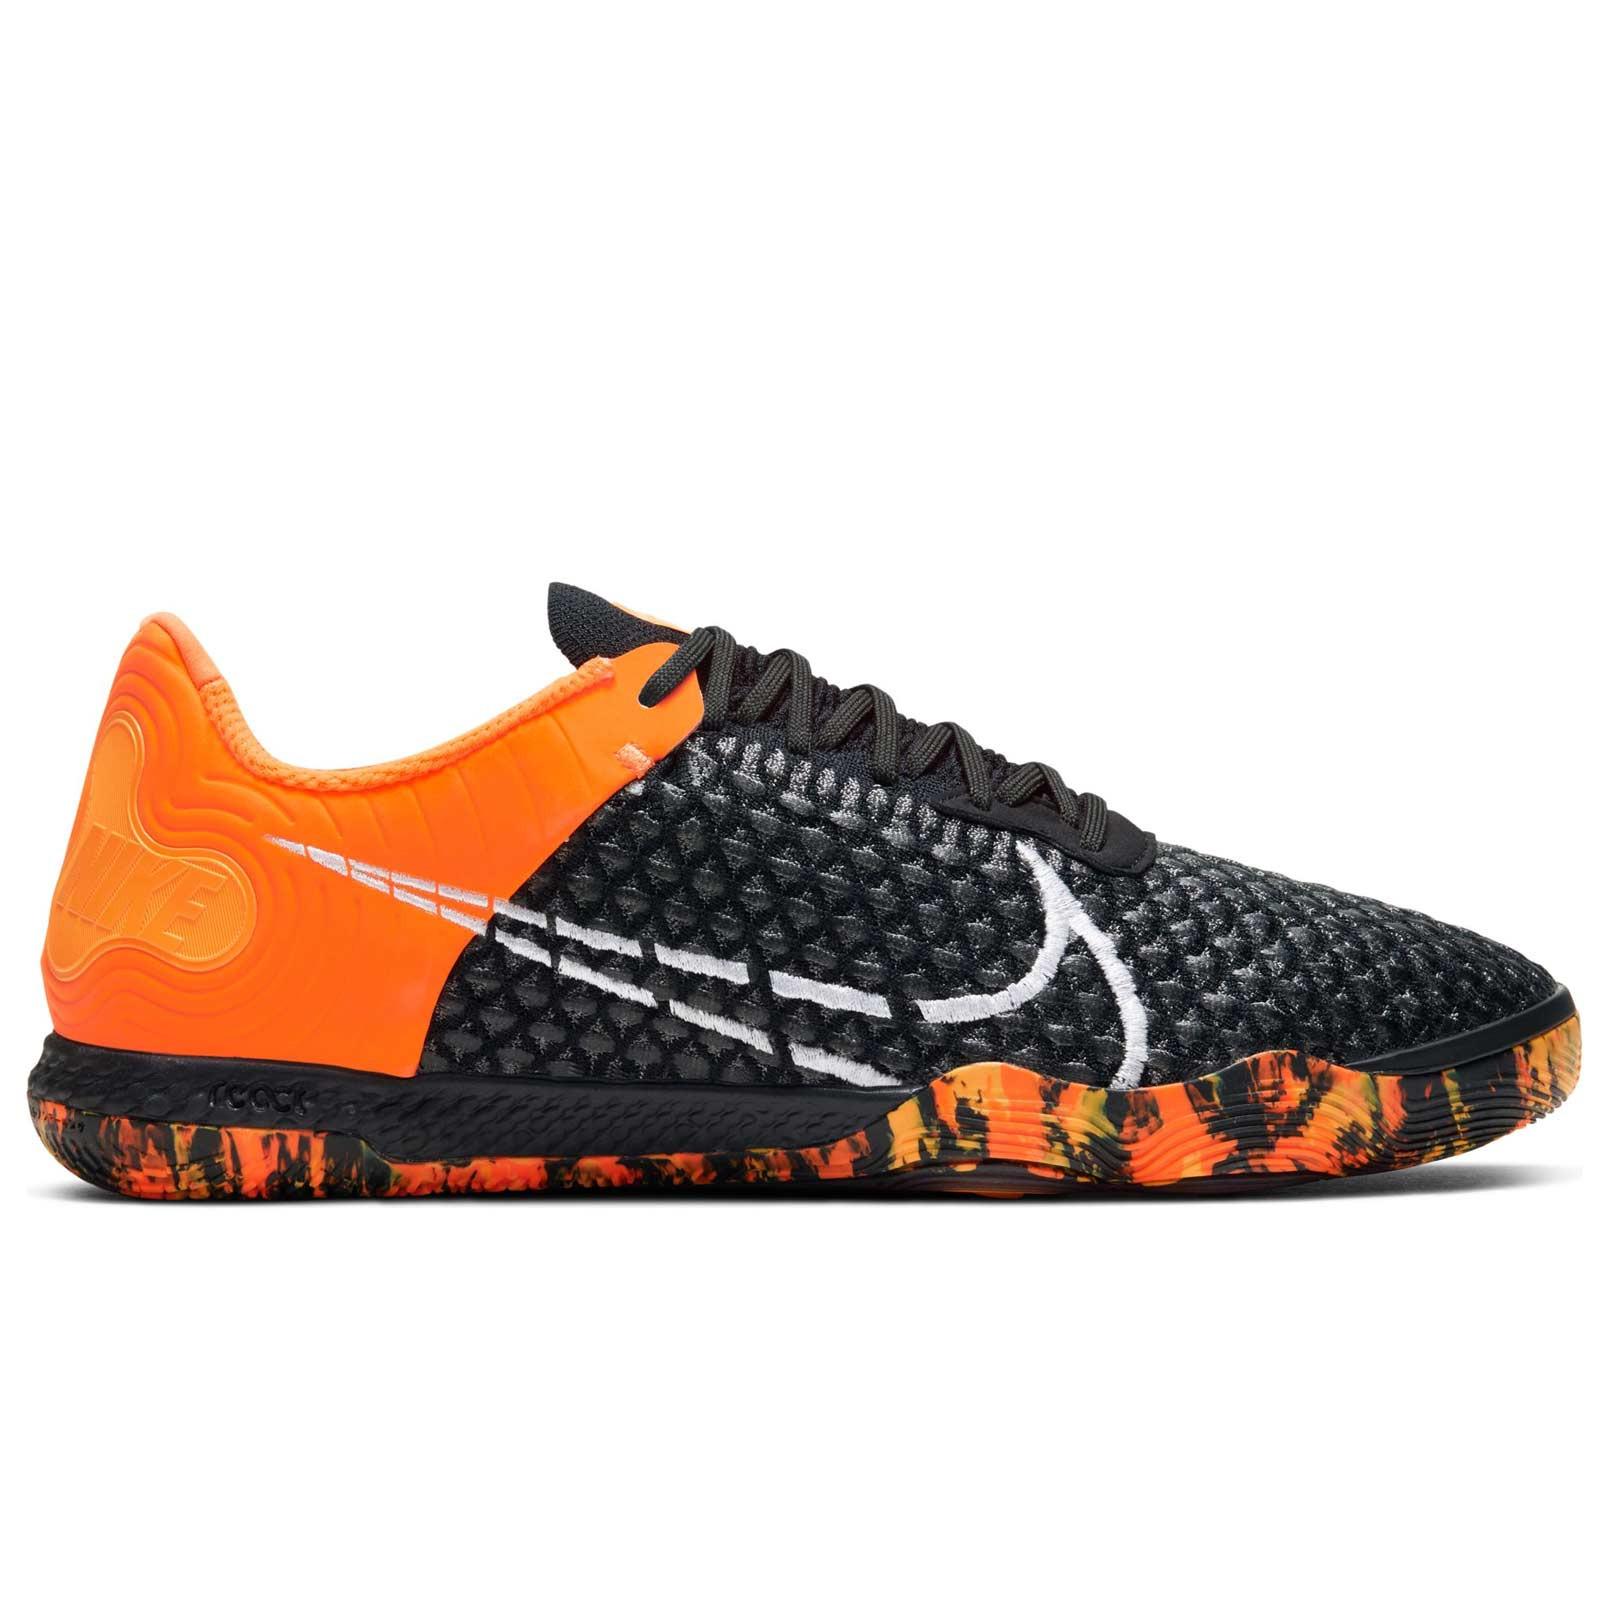 regla confiar Objeción  Zapatillas futsal Nike React Gato negras | futbolmania